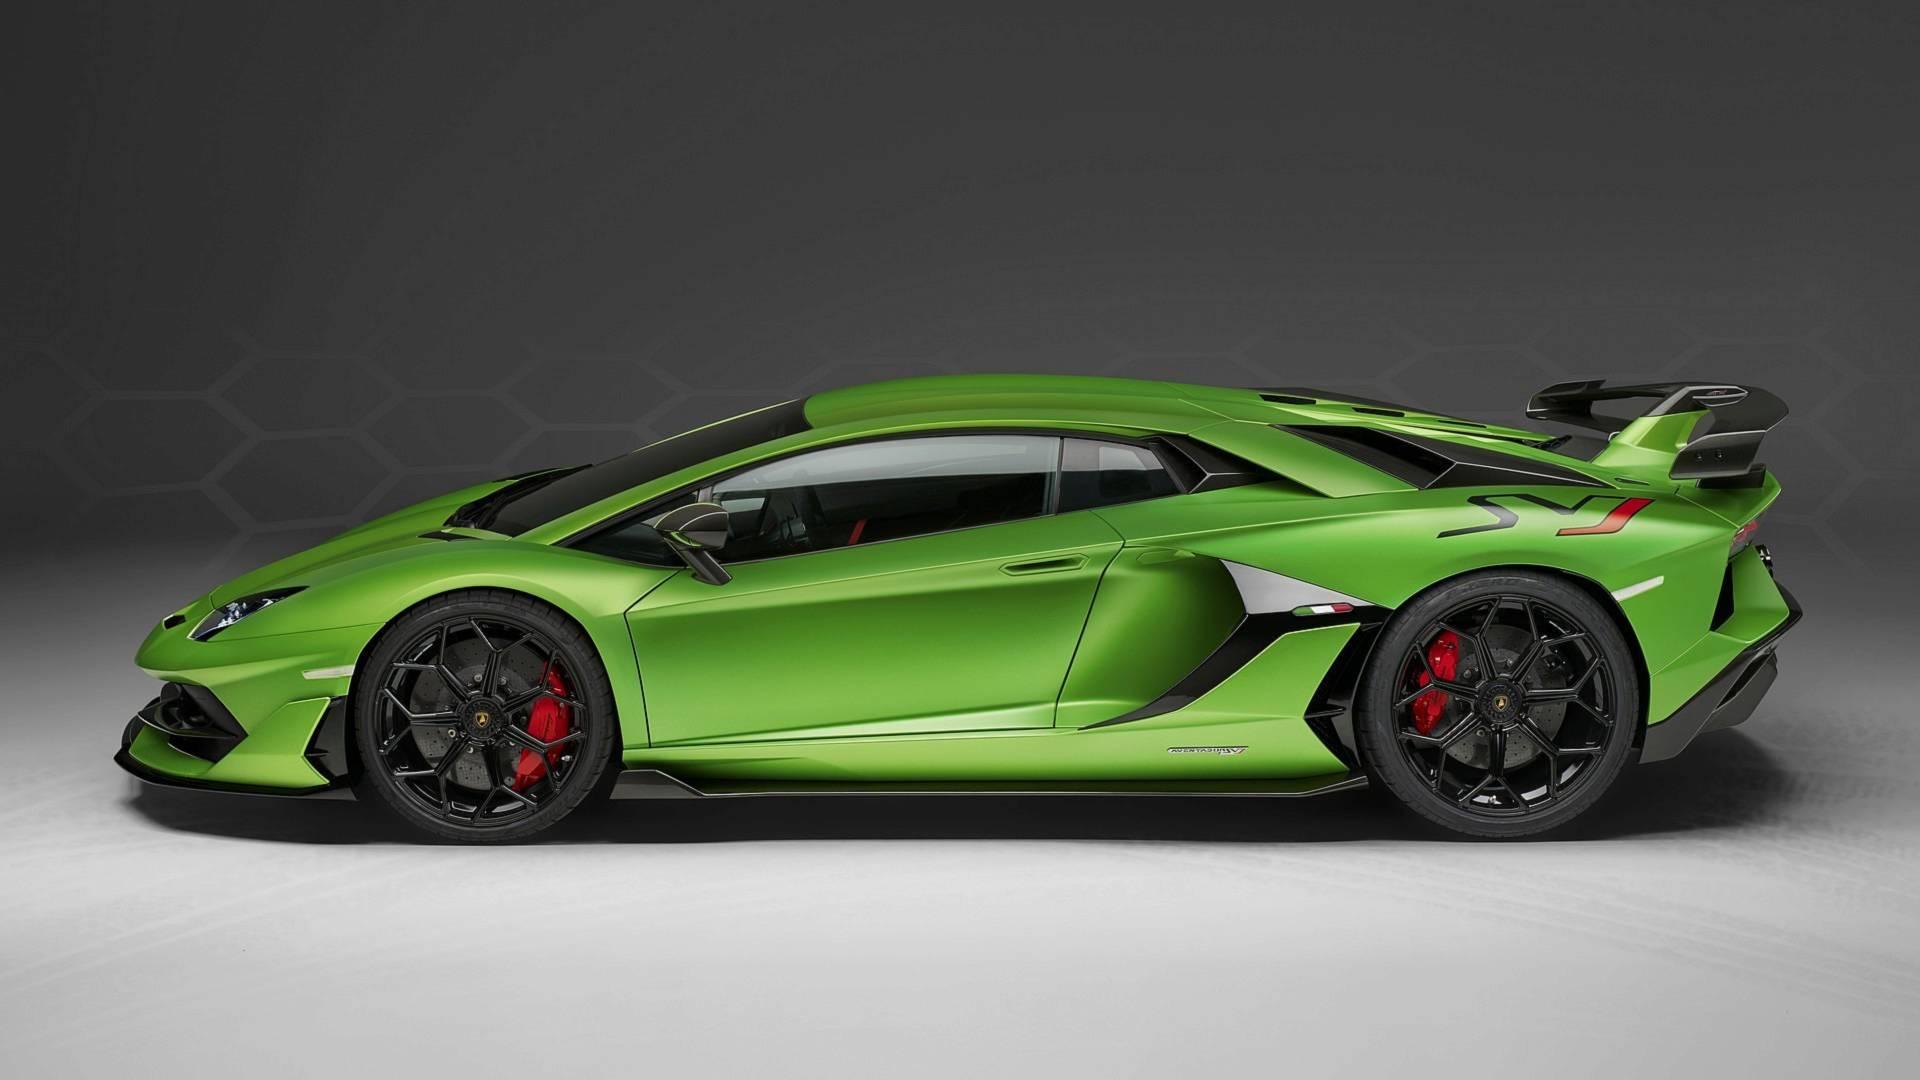 Lamborghini Aventador Svj Looks Complicated In Live Footage Autoevolution